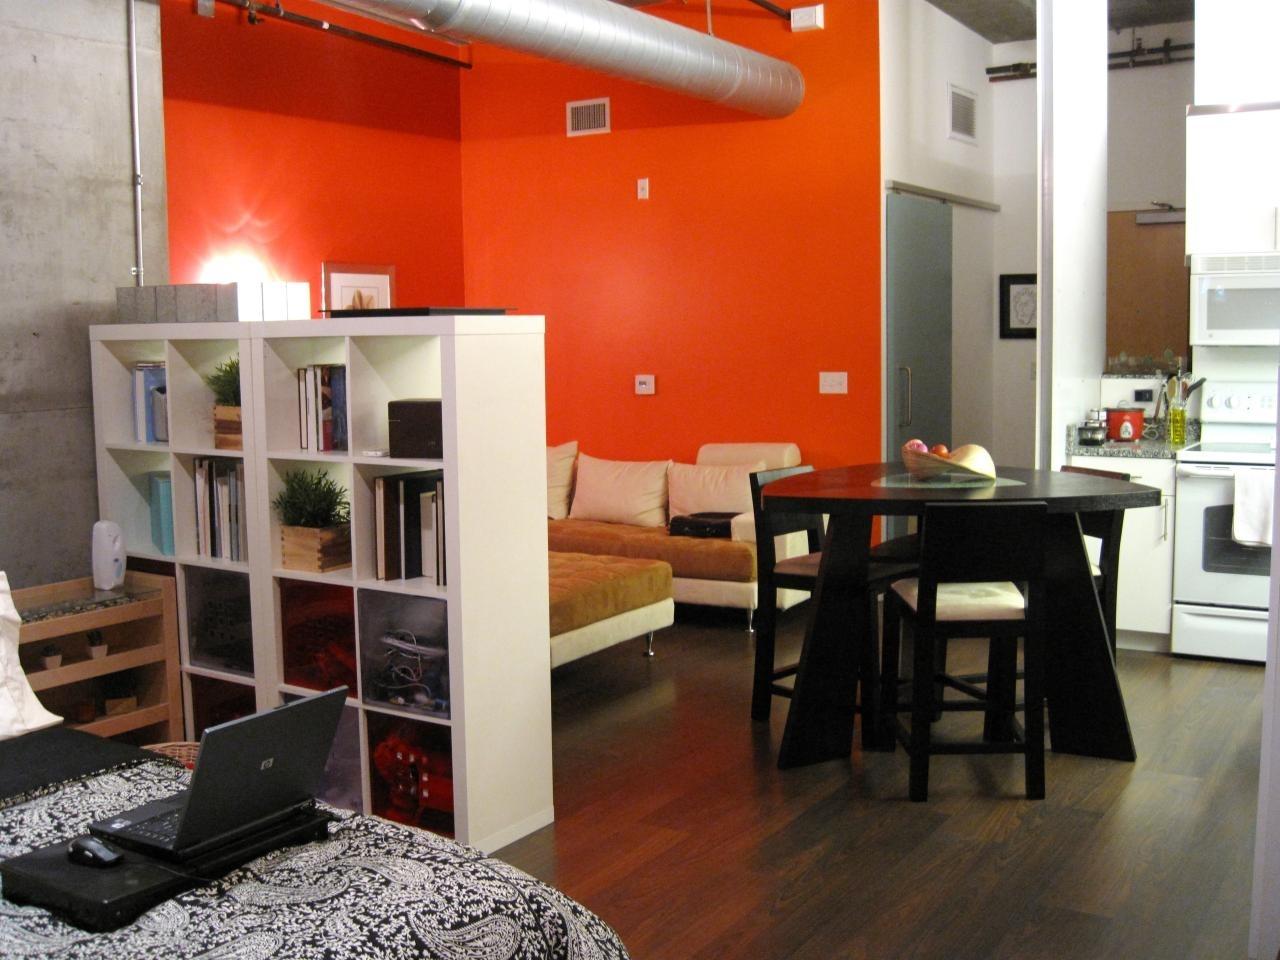 10 Ideal Small Studio Apartment Decorating Ideas %name 2020